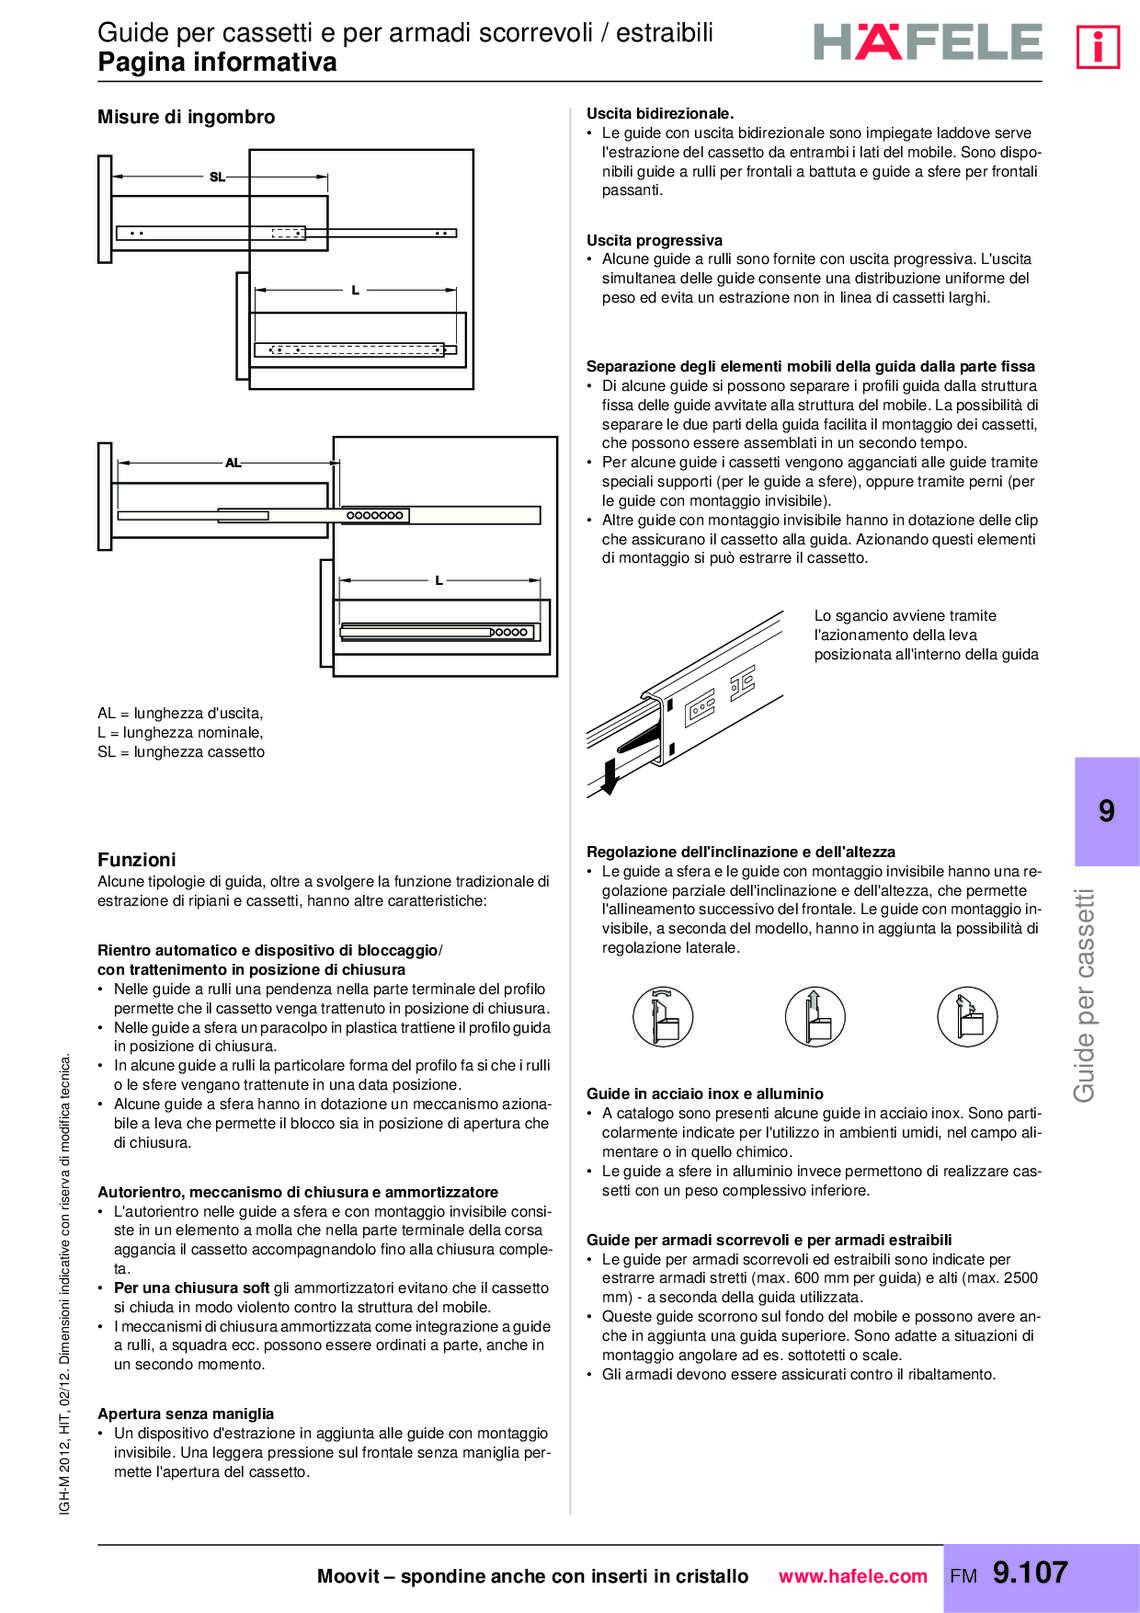 hafele-spondine-e-guide-per-mobili_40_154.jpg